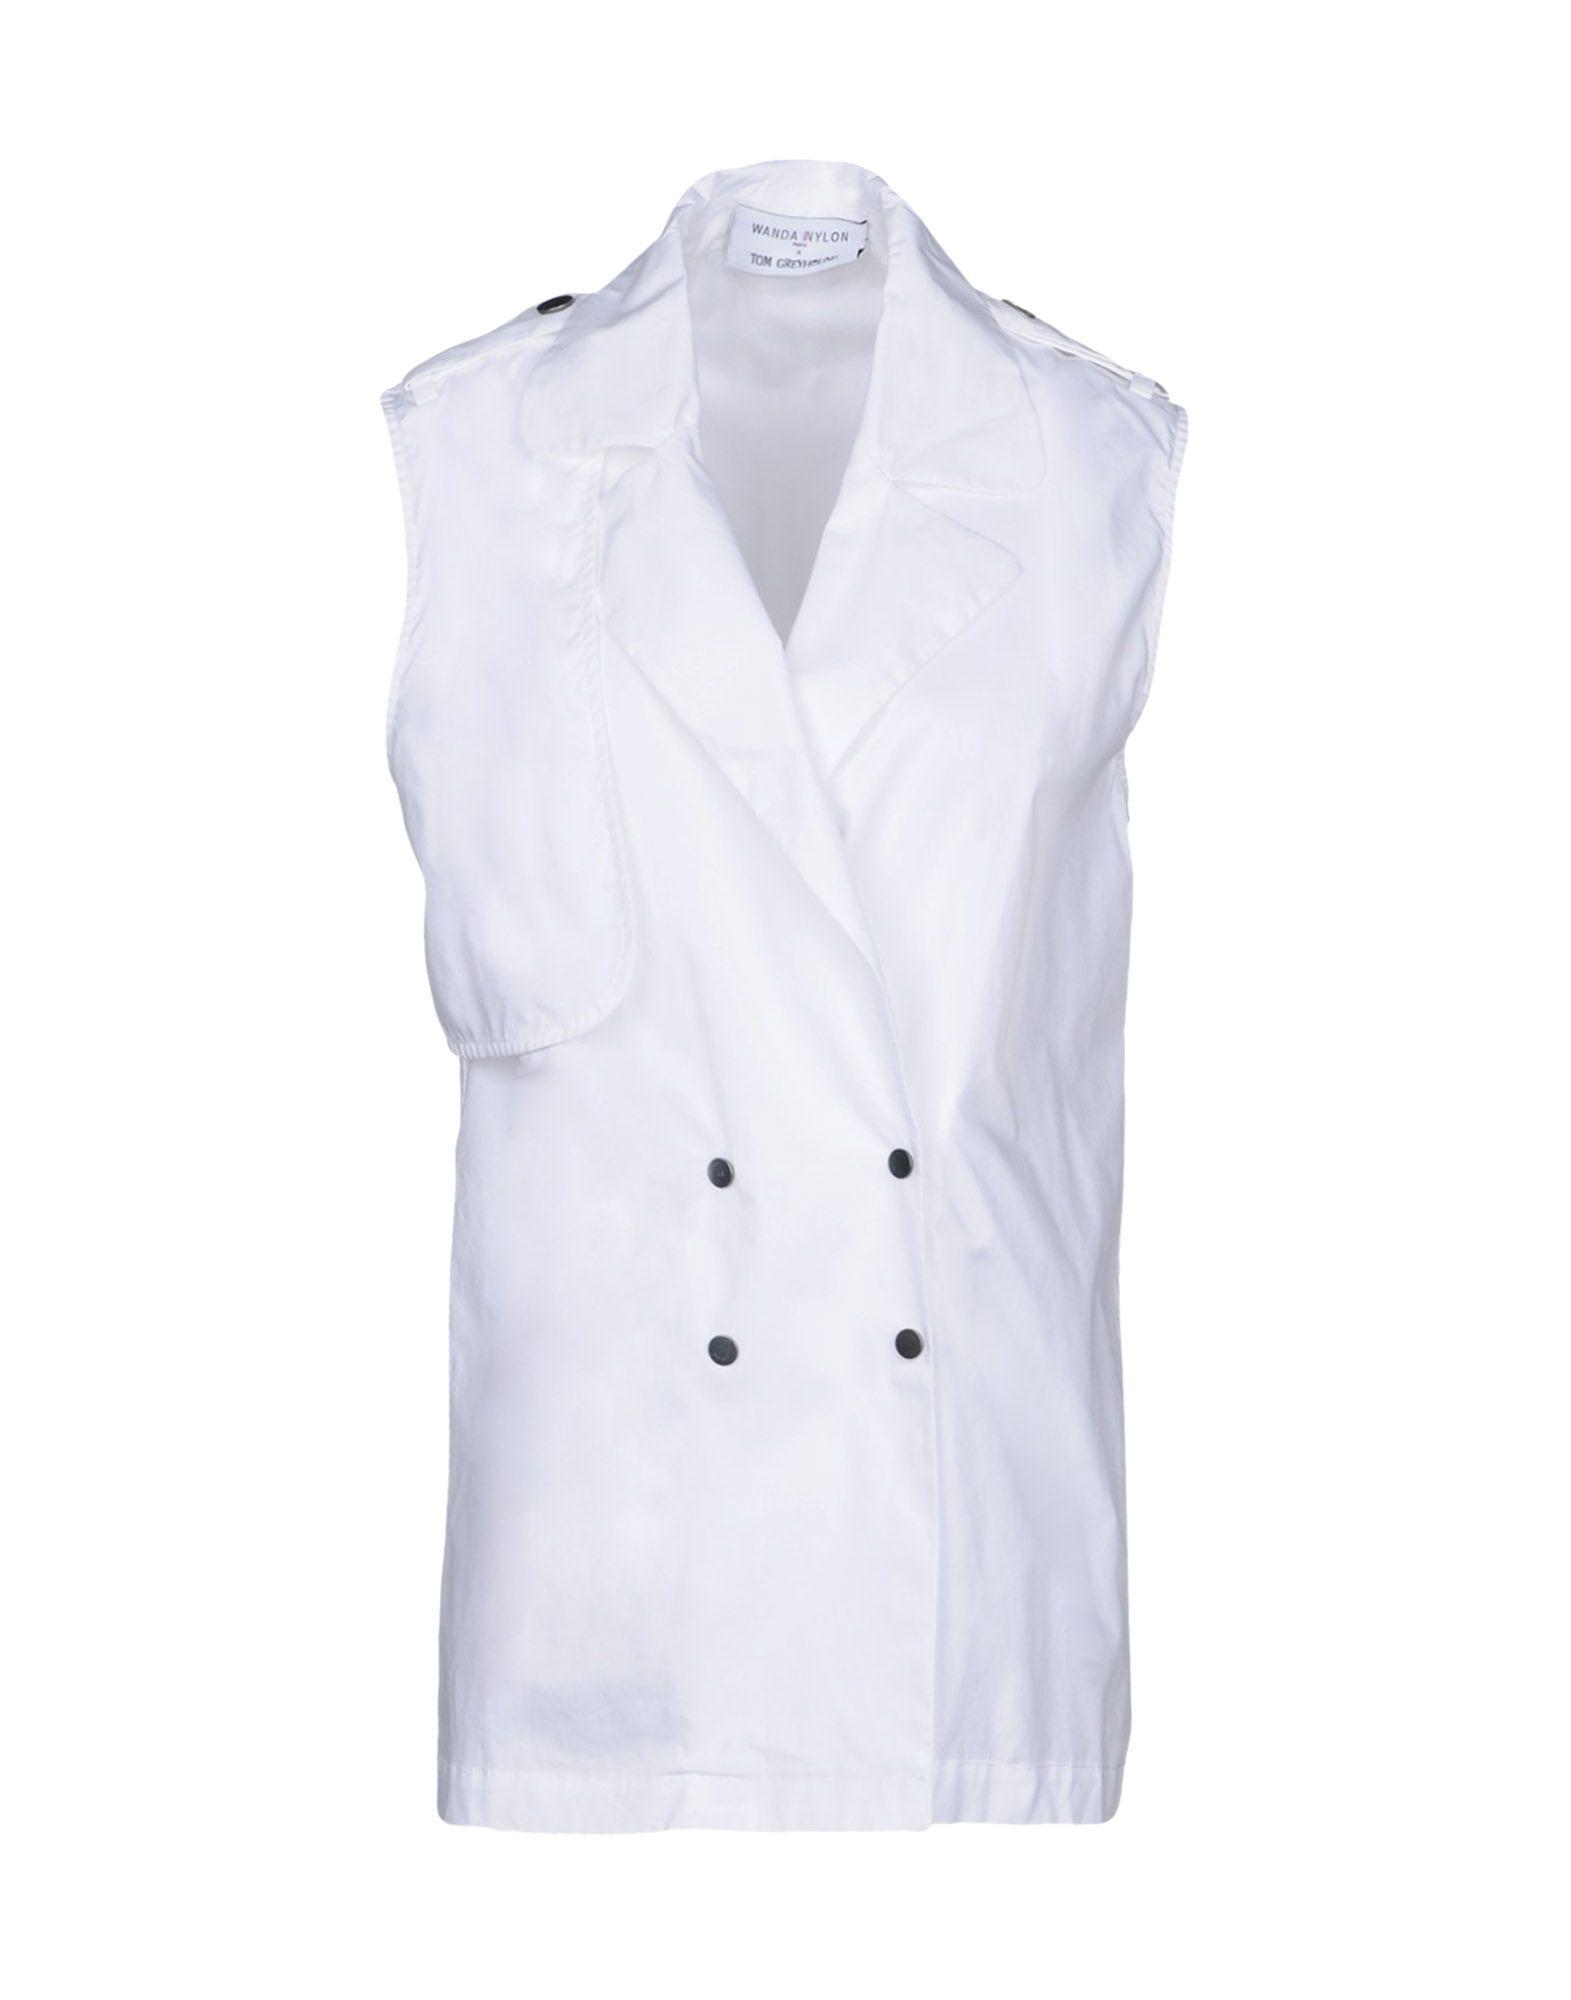 Wanda Nylon Blazer In White